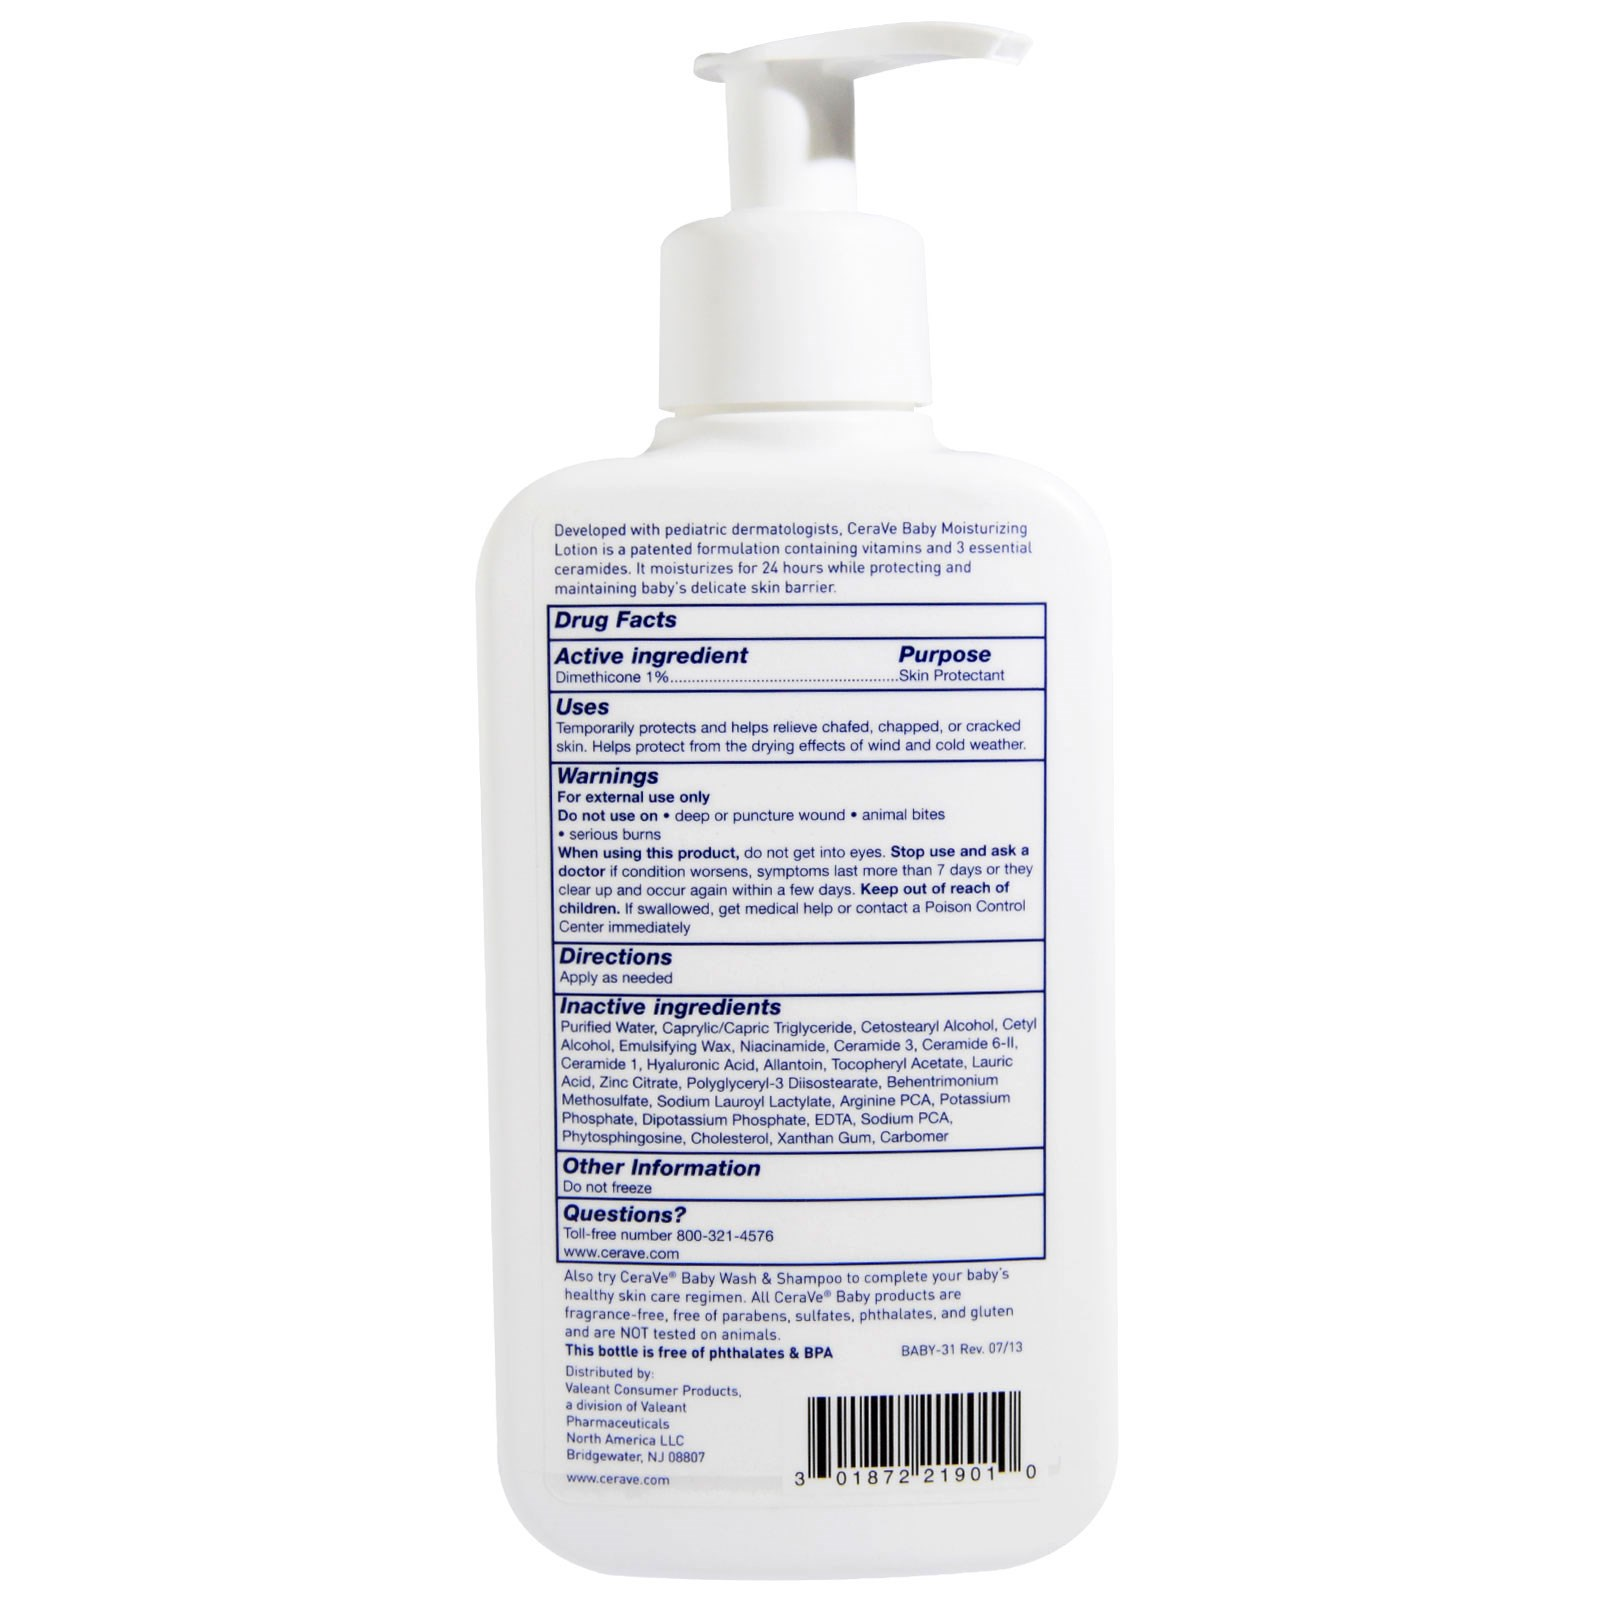 CeraVe. 嬰兒保濕乳液。8盎司(237ml) - iHerb.com